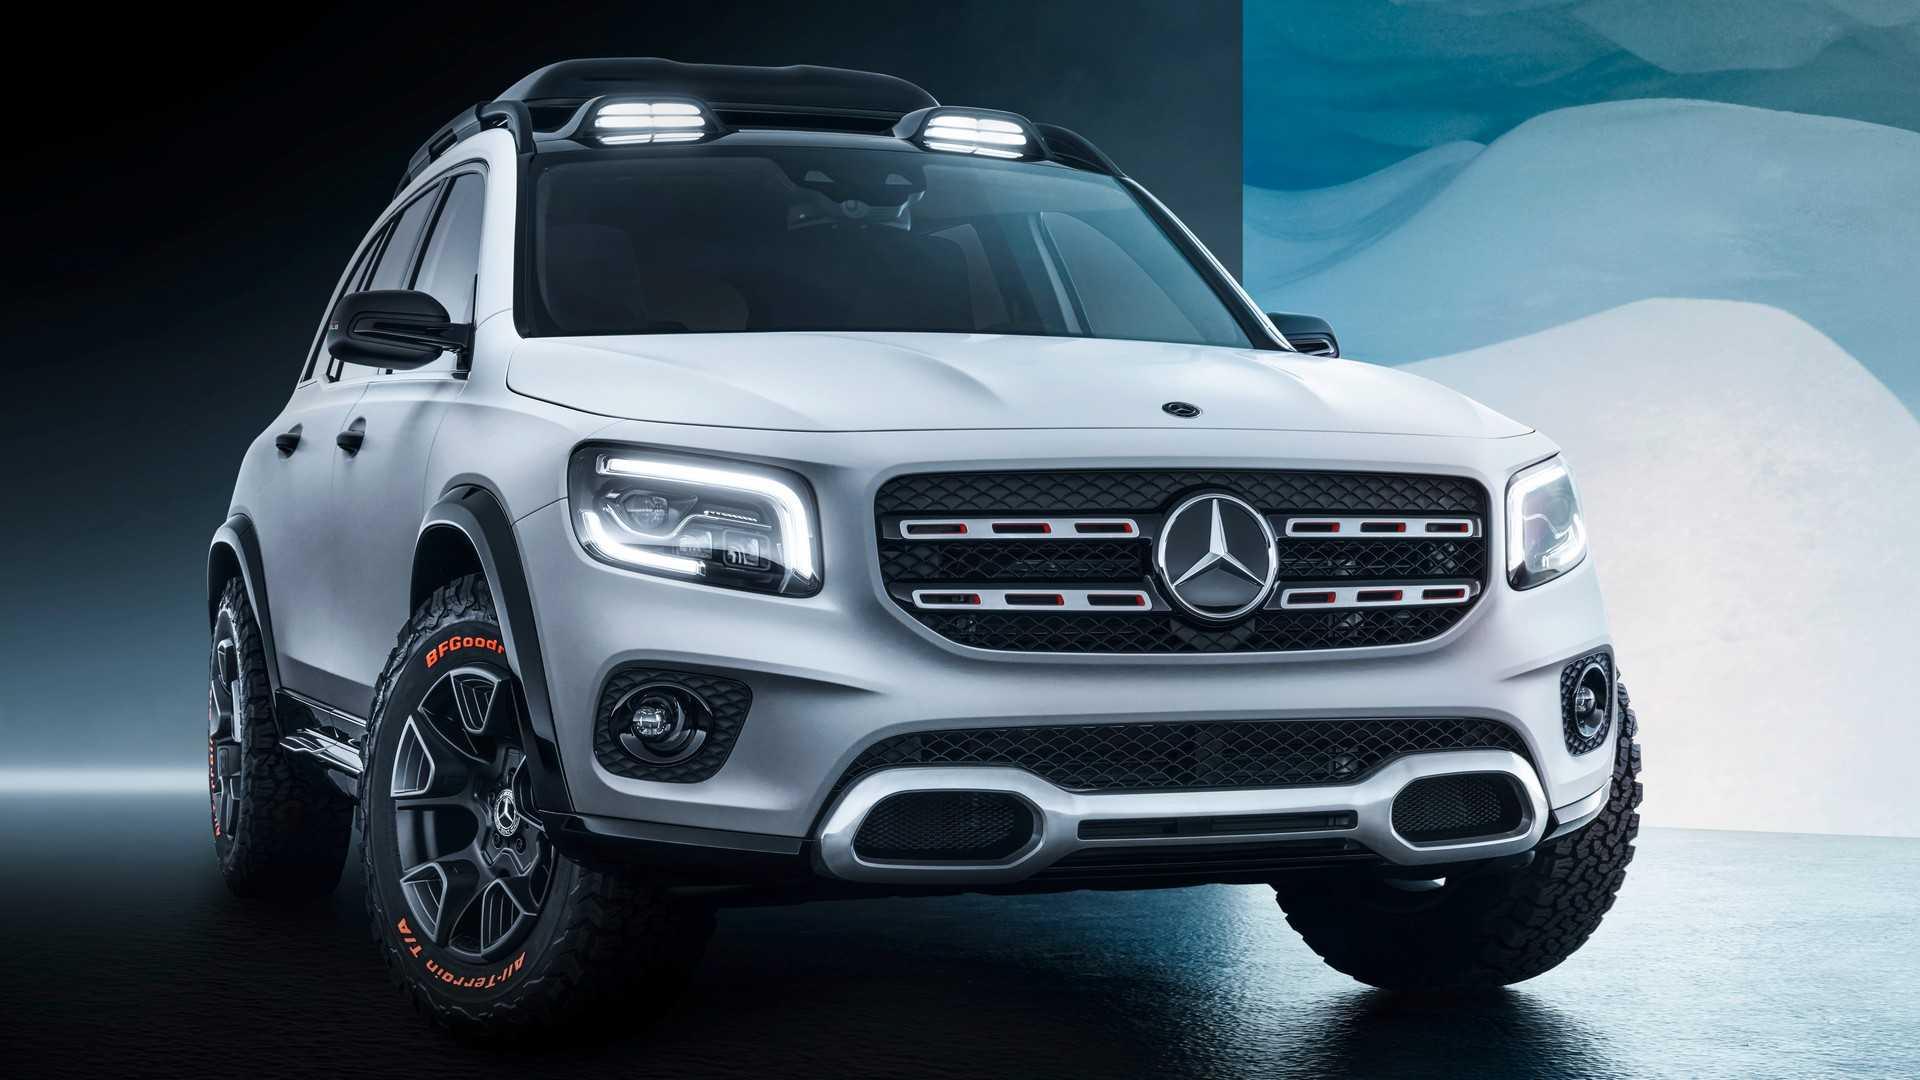 Habrá un Mercedes GLB más radical: primeros detalles